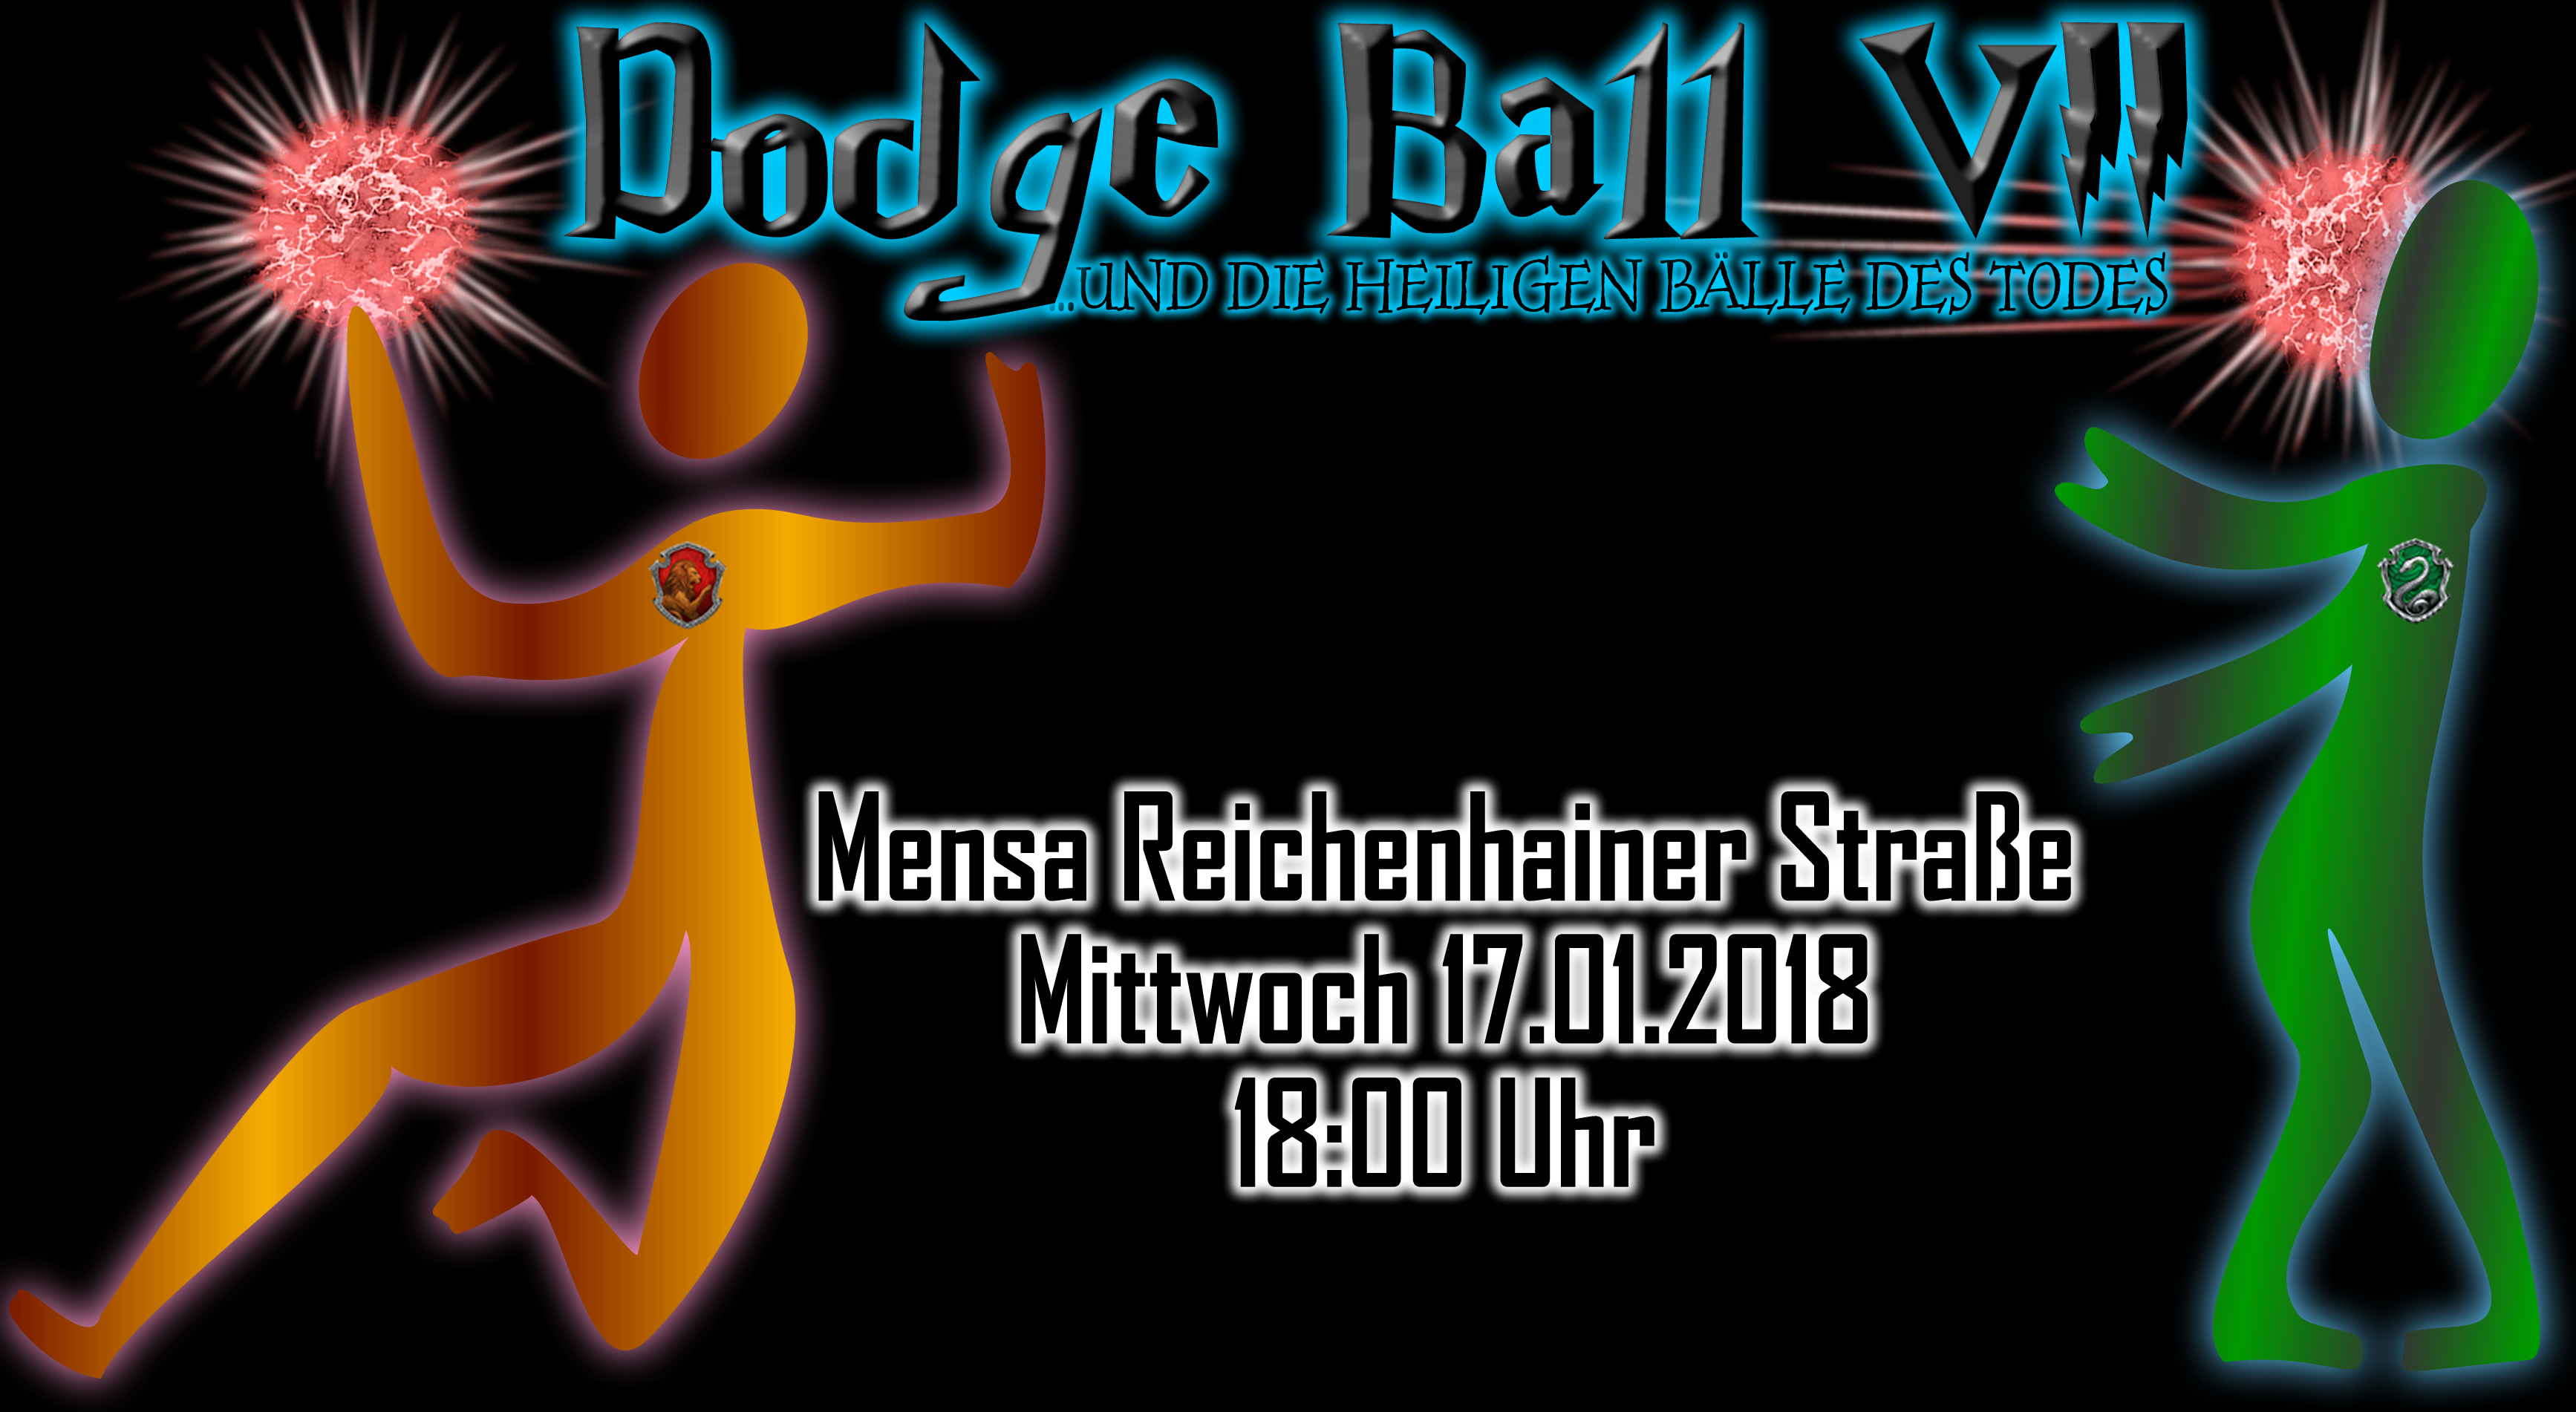 Dodgeball Chemnitz